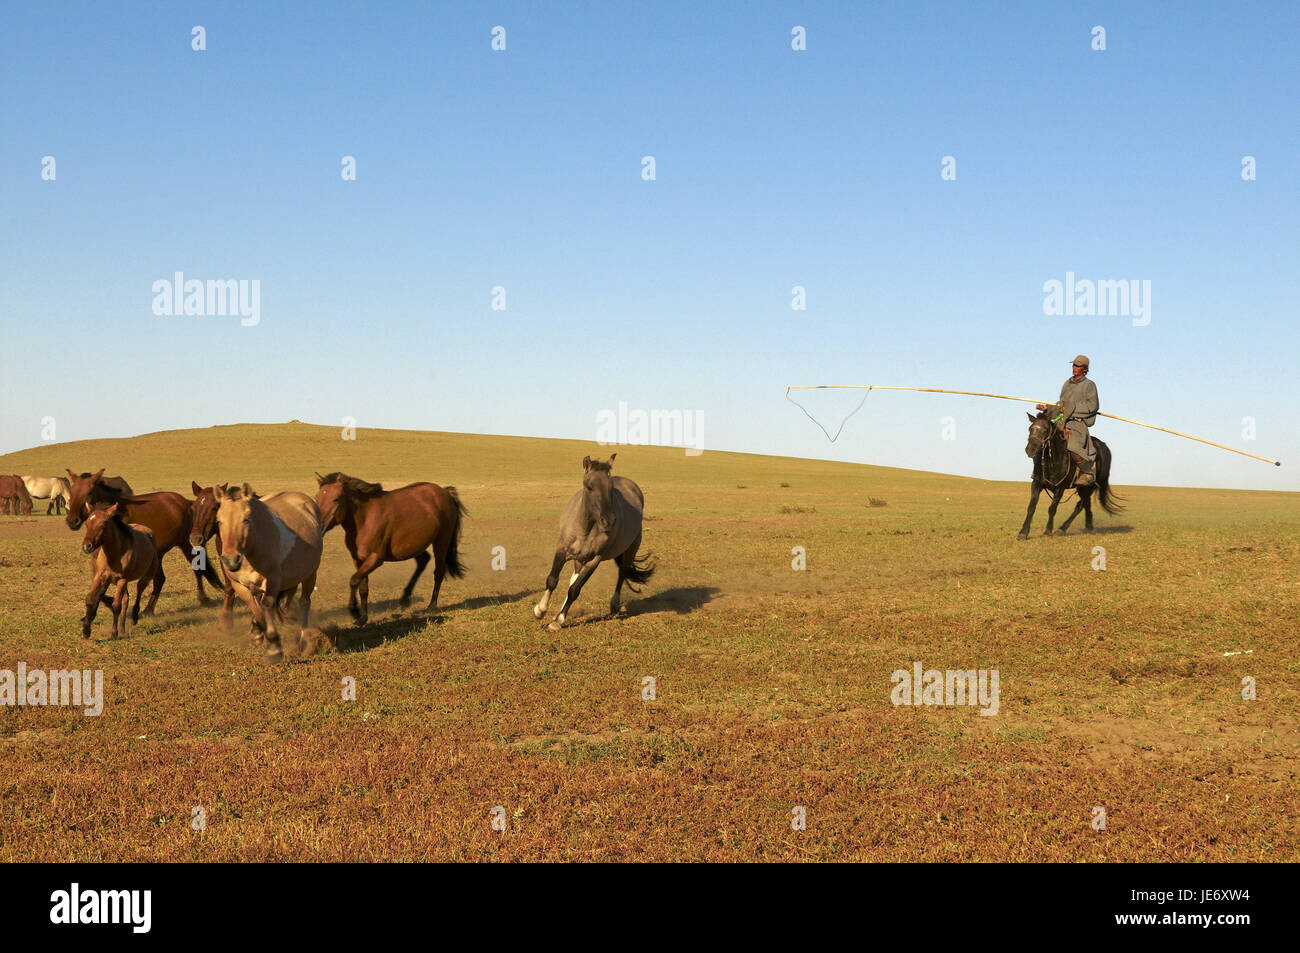 Mongolia, Central Asia, Arkhangai province, nomad, man traps horses with the Urga, - Stock Image